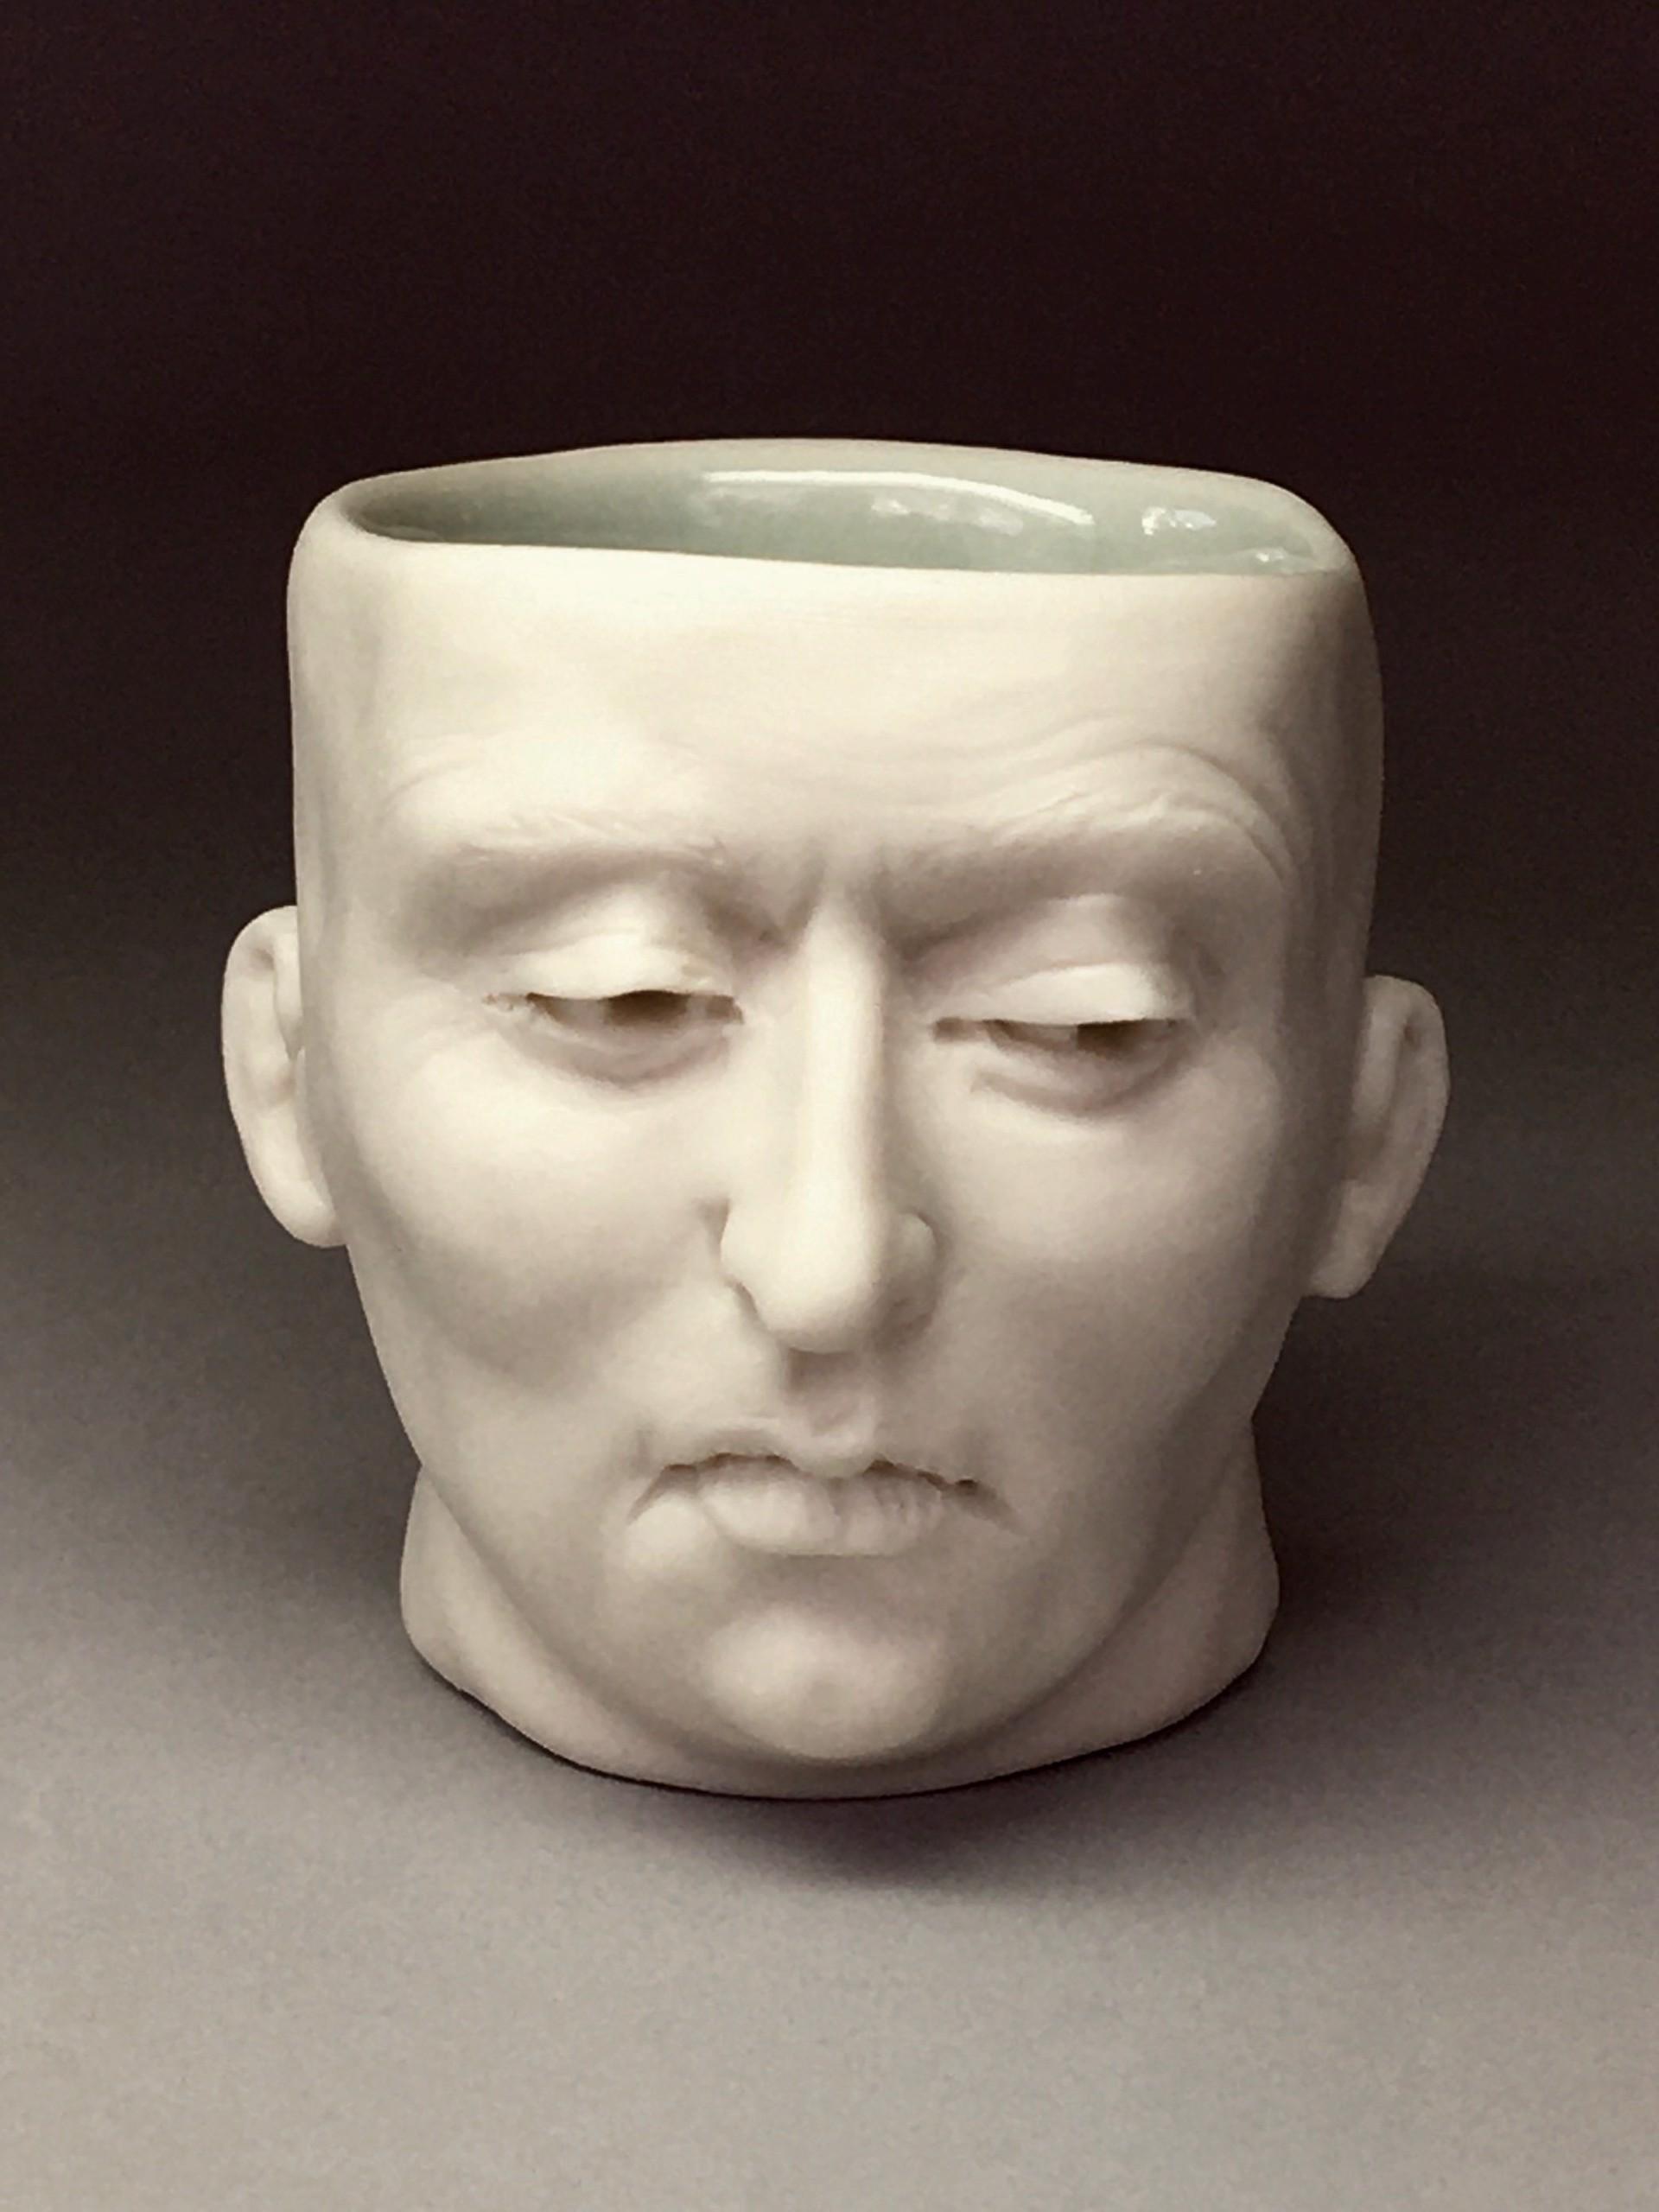 """Skeptical Friend Shot Glass II"" (light blue interior, open eyes) by Adrian Arleo"